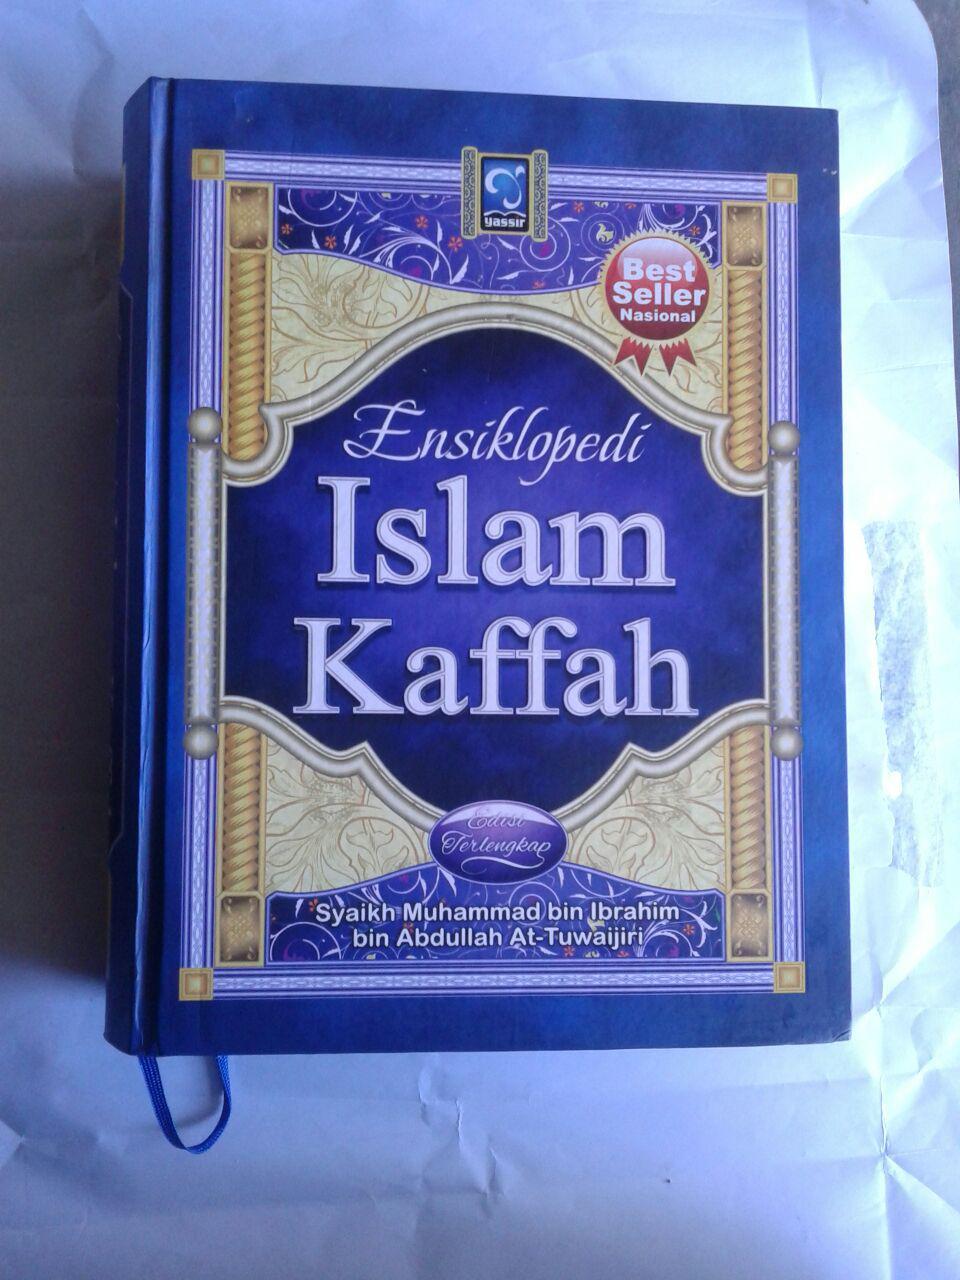 Buku Ensiklopedi Islam Kaffah Edisi Terlengkap cover